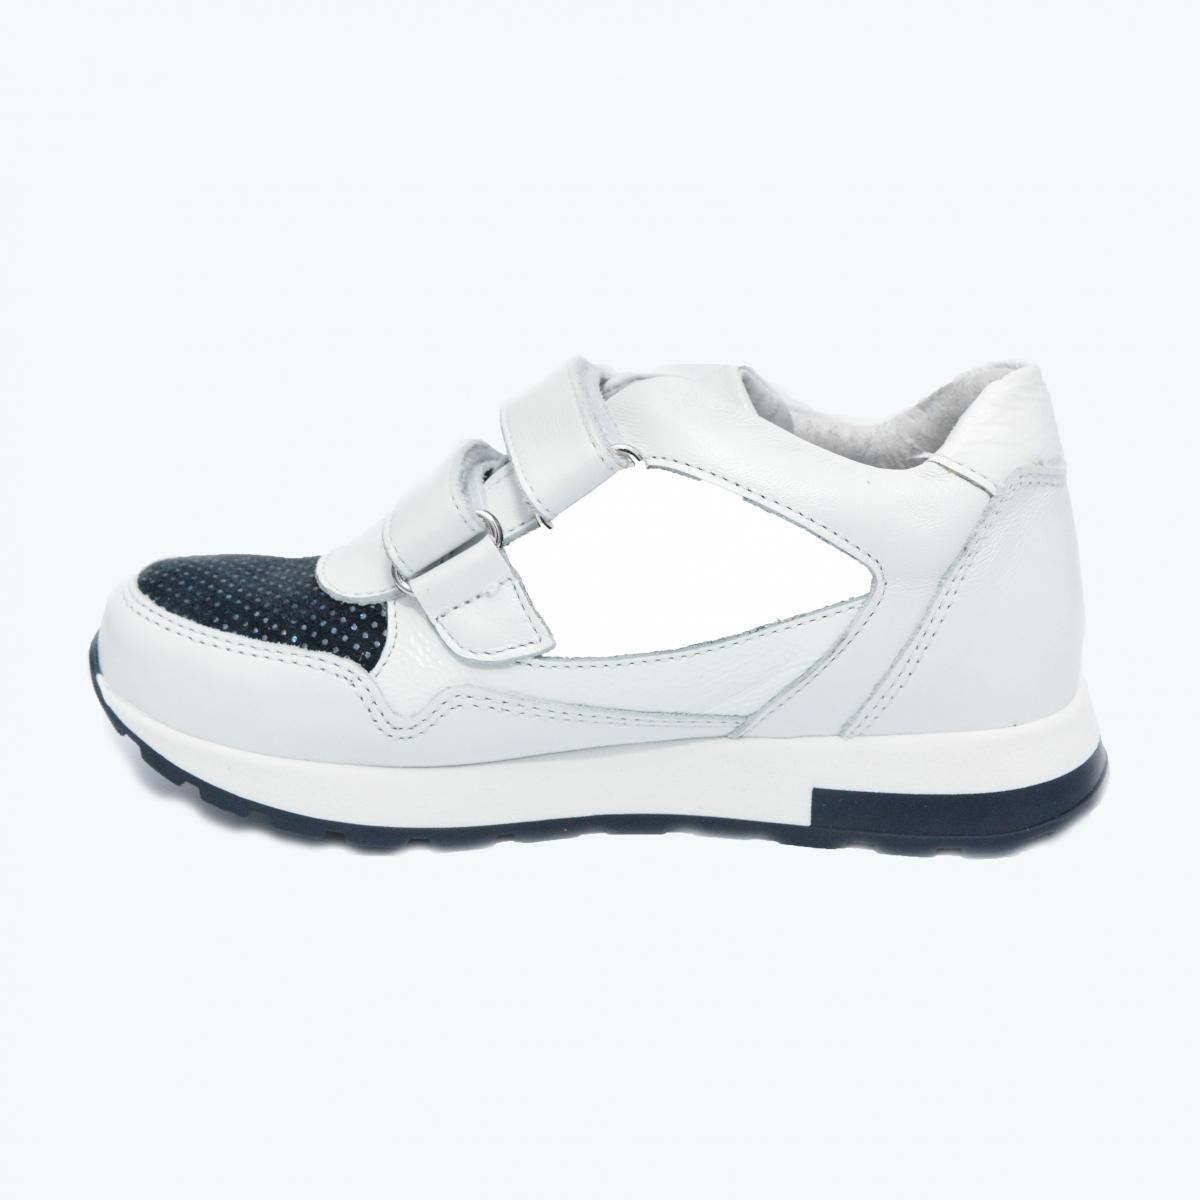 Pantofi sport fete din piele hokide 450 alb 26-35